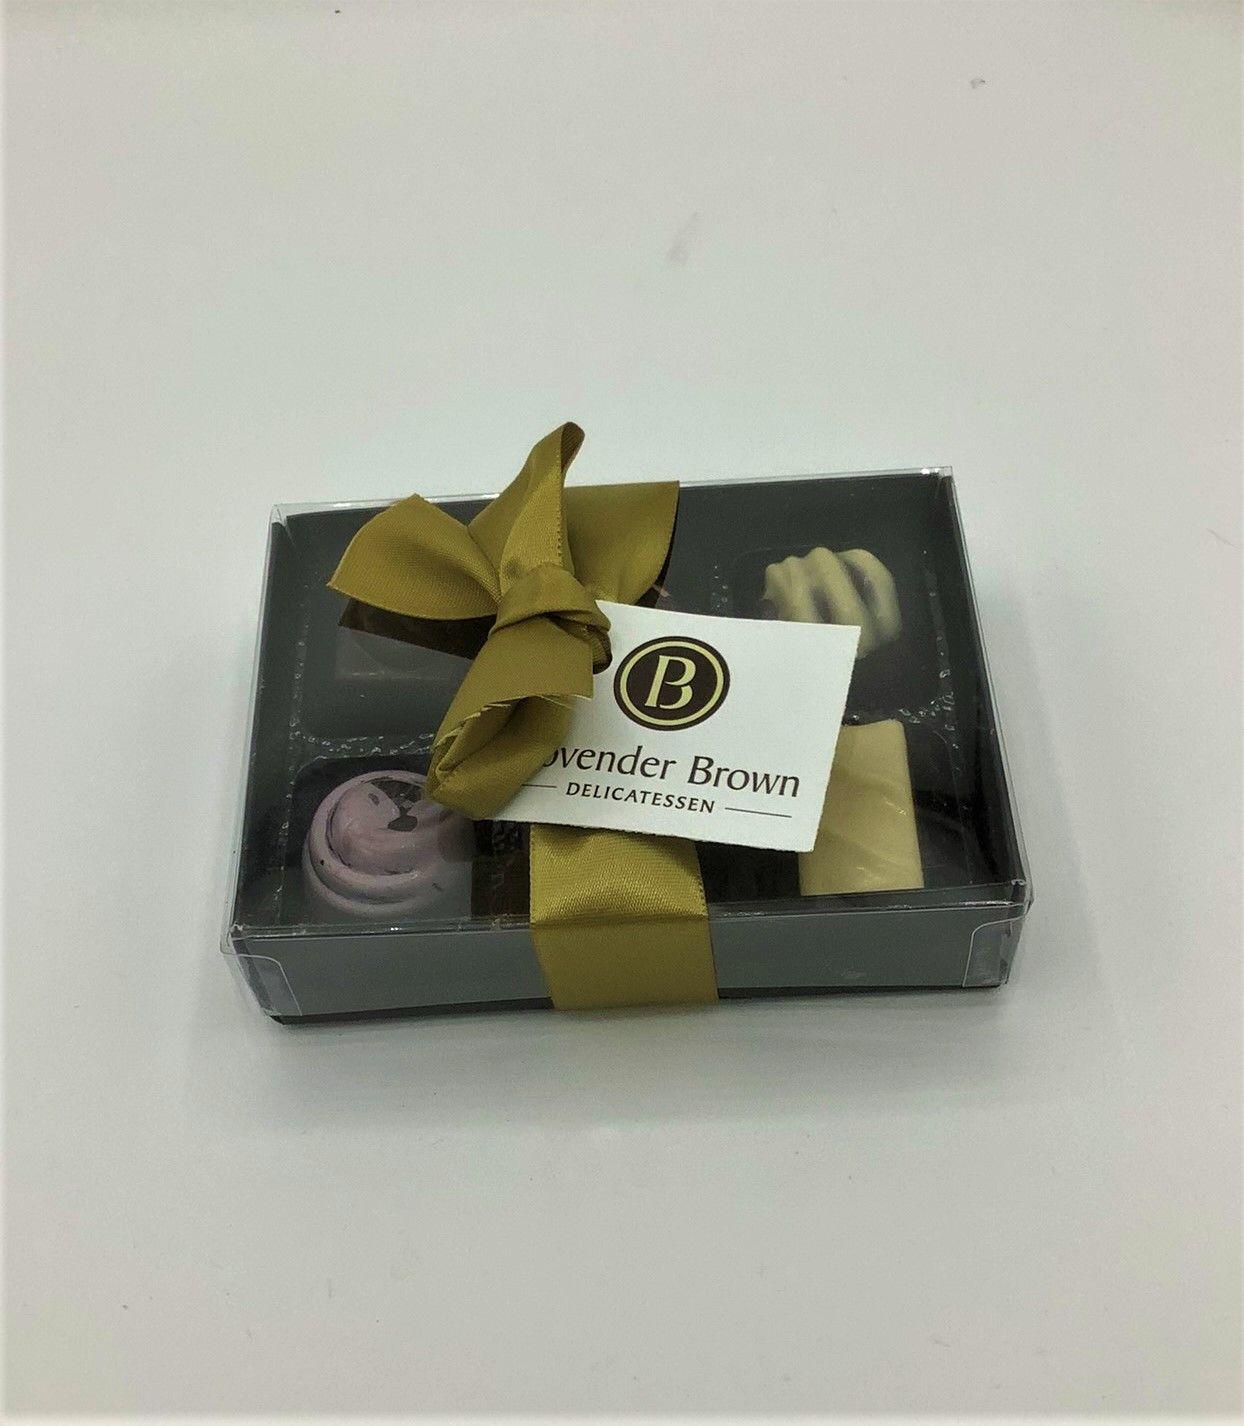 Provender Brown 6 Chocolates Gifting Chocolates